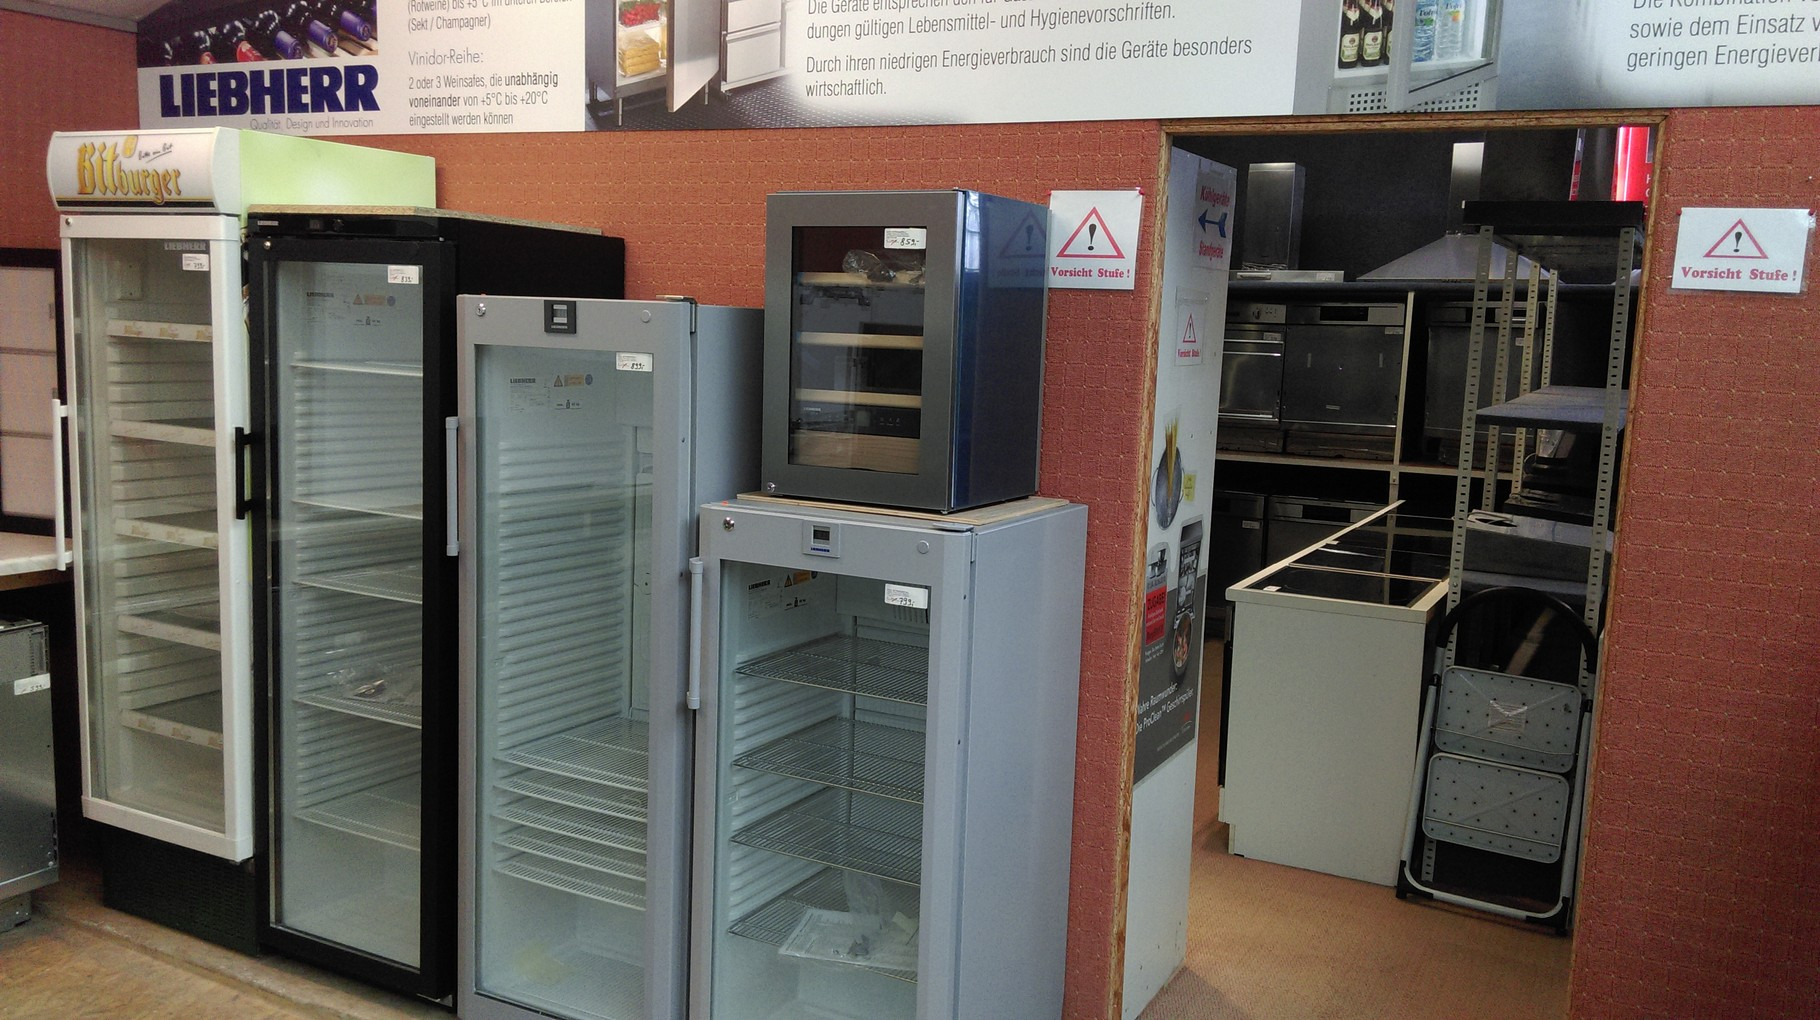 Gorenje Kühlschrank Lila : Kühlschrank welche stufe kühlschrank oldschool jennifer h juarez